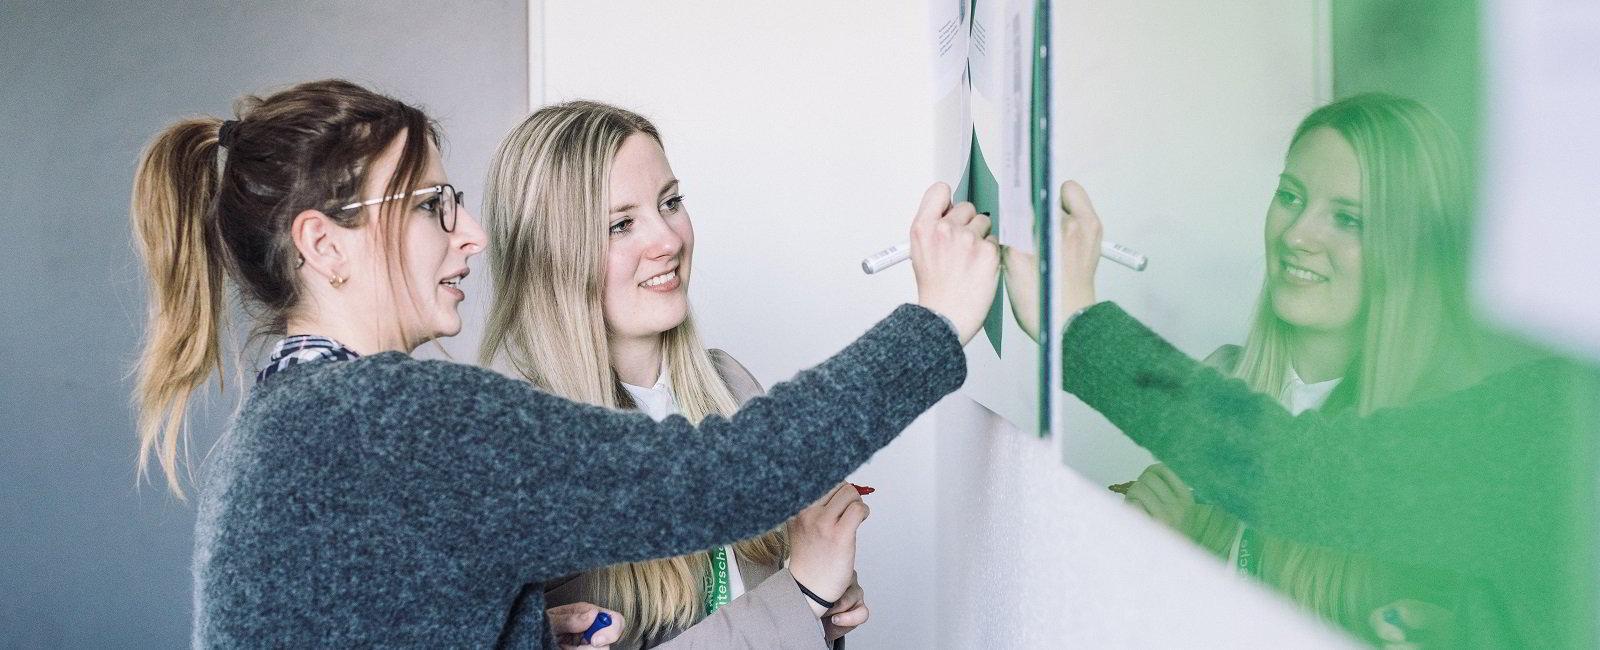 Mitarbeiter an whiteboard